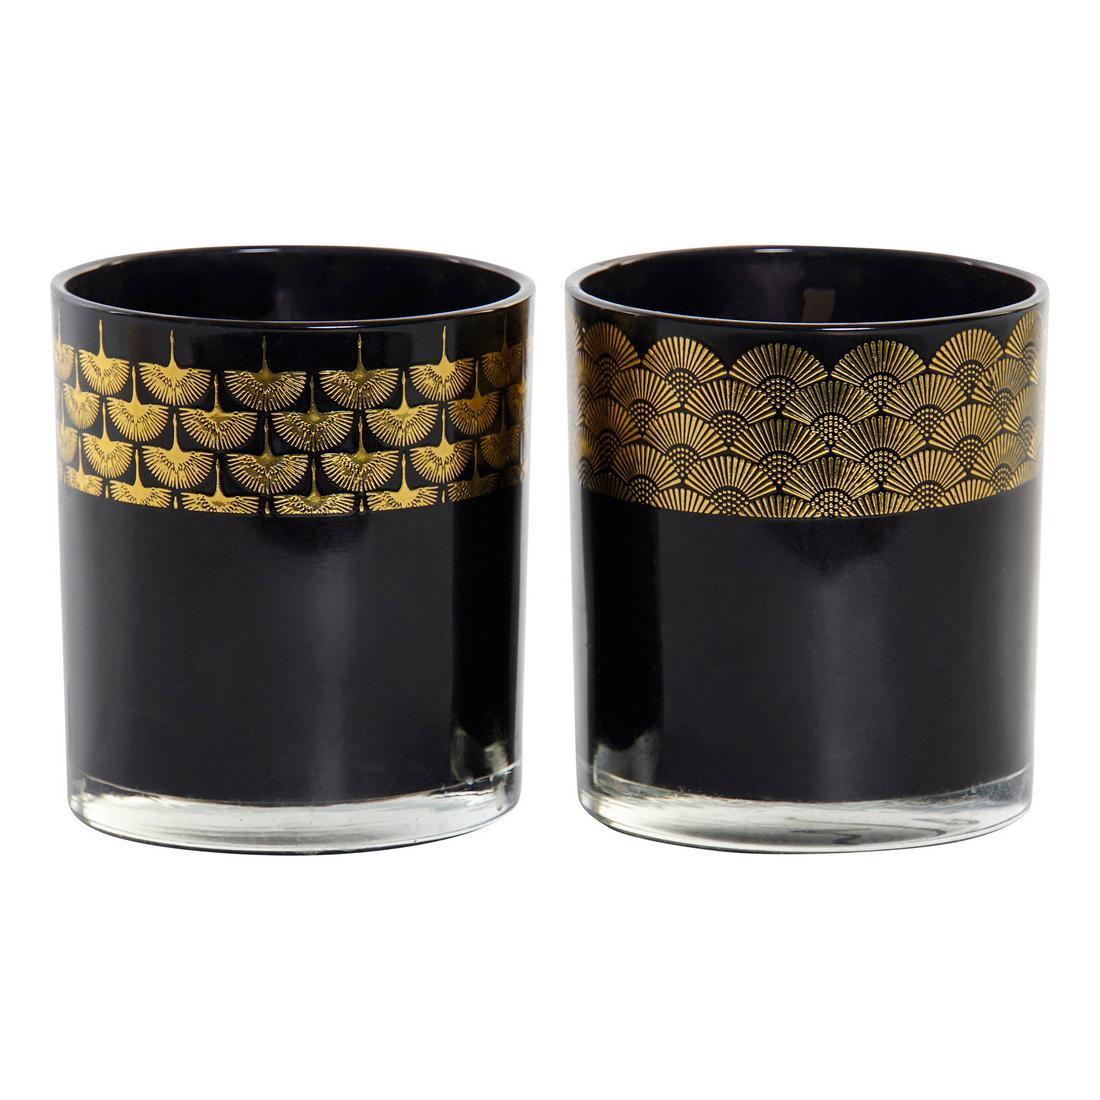 Candle DKD Home Decor Black (2 pcs)